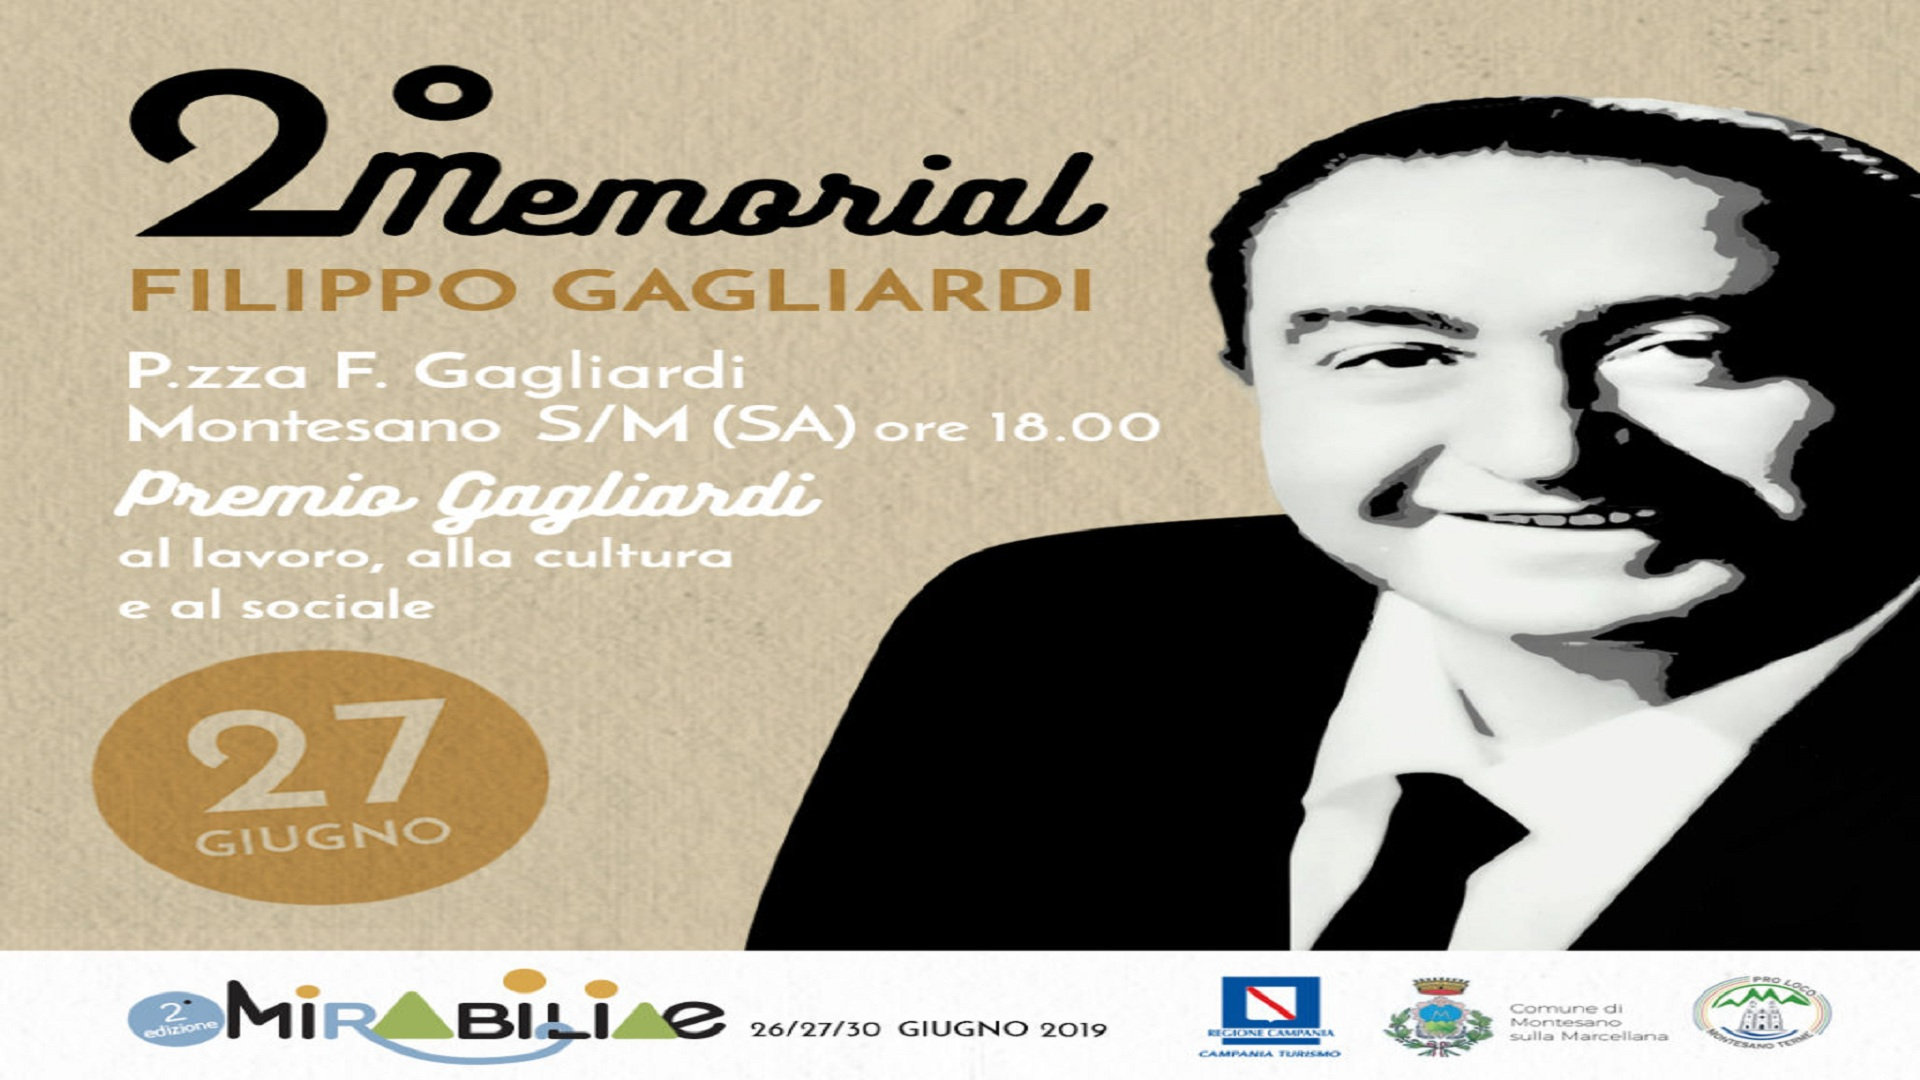 GAGLIARDI_MEMORIAL2019-1024x1024